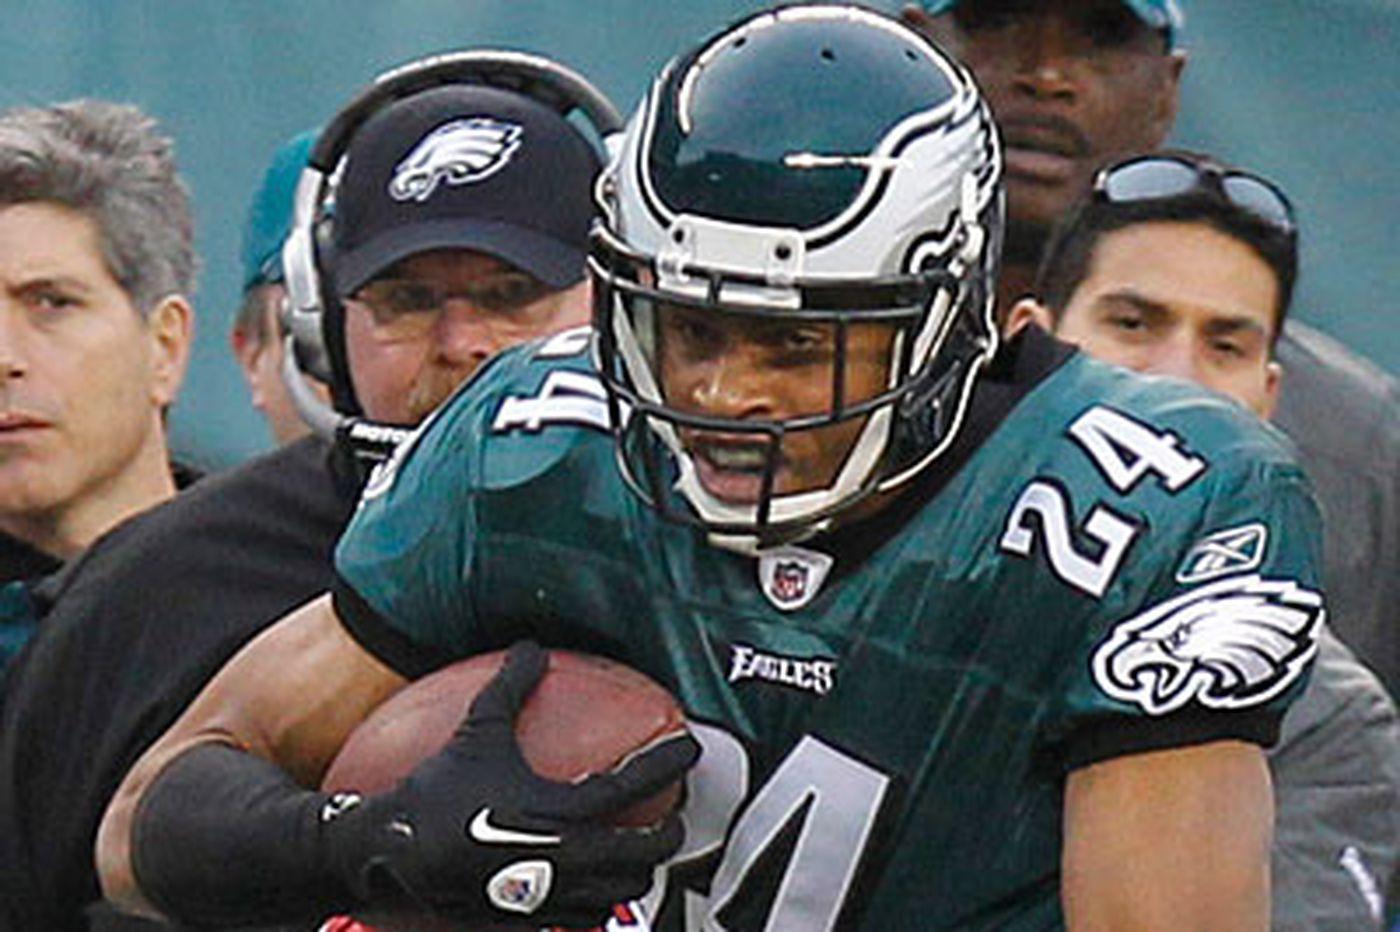 Breaking down the Eagles' defensive backs